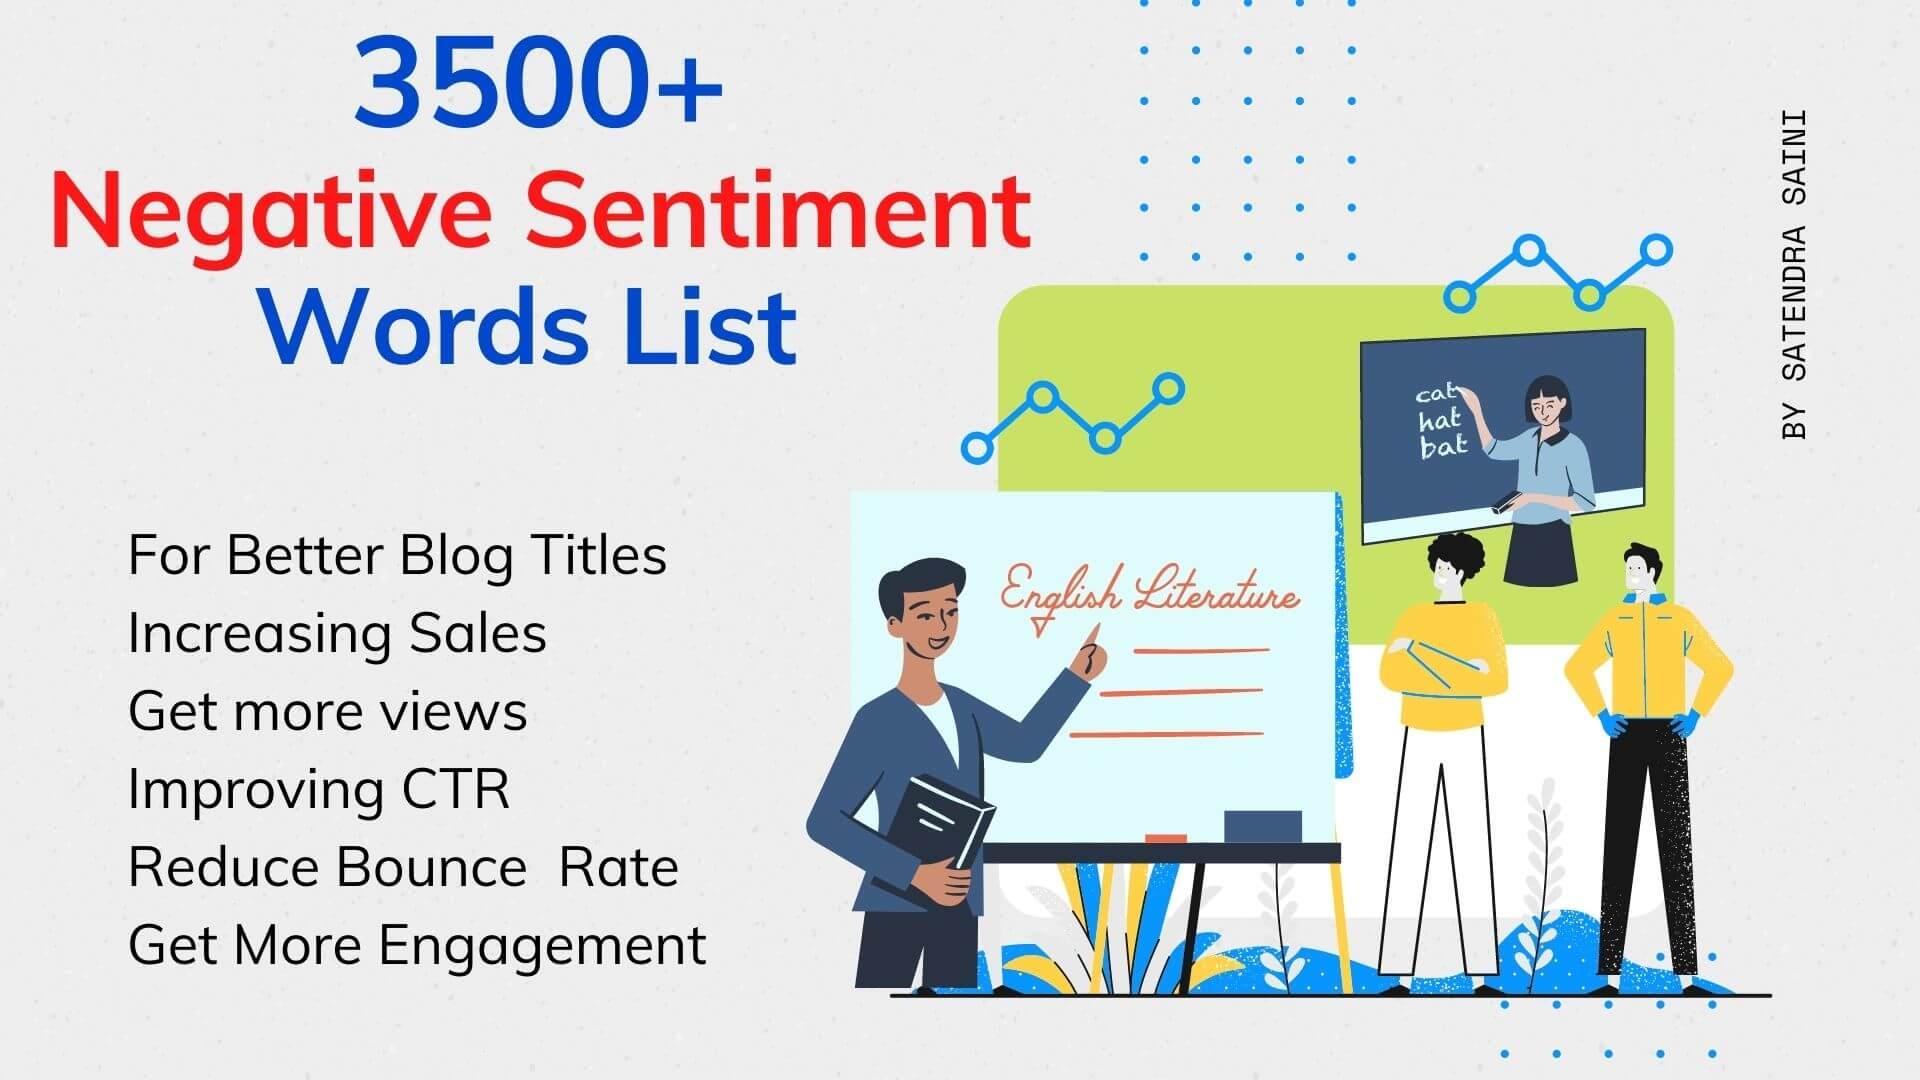 Negative Sentiment Words List